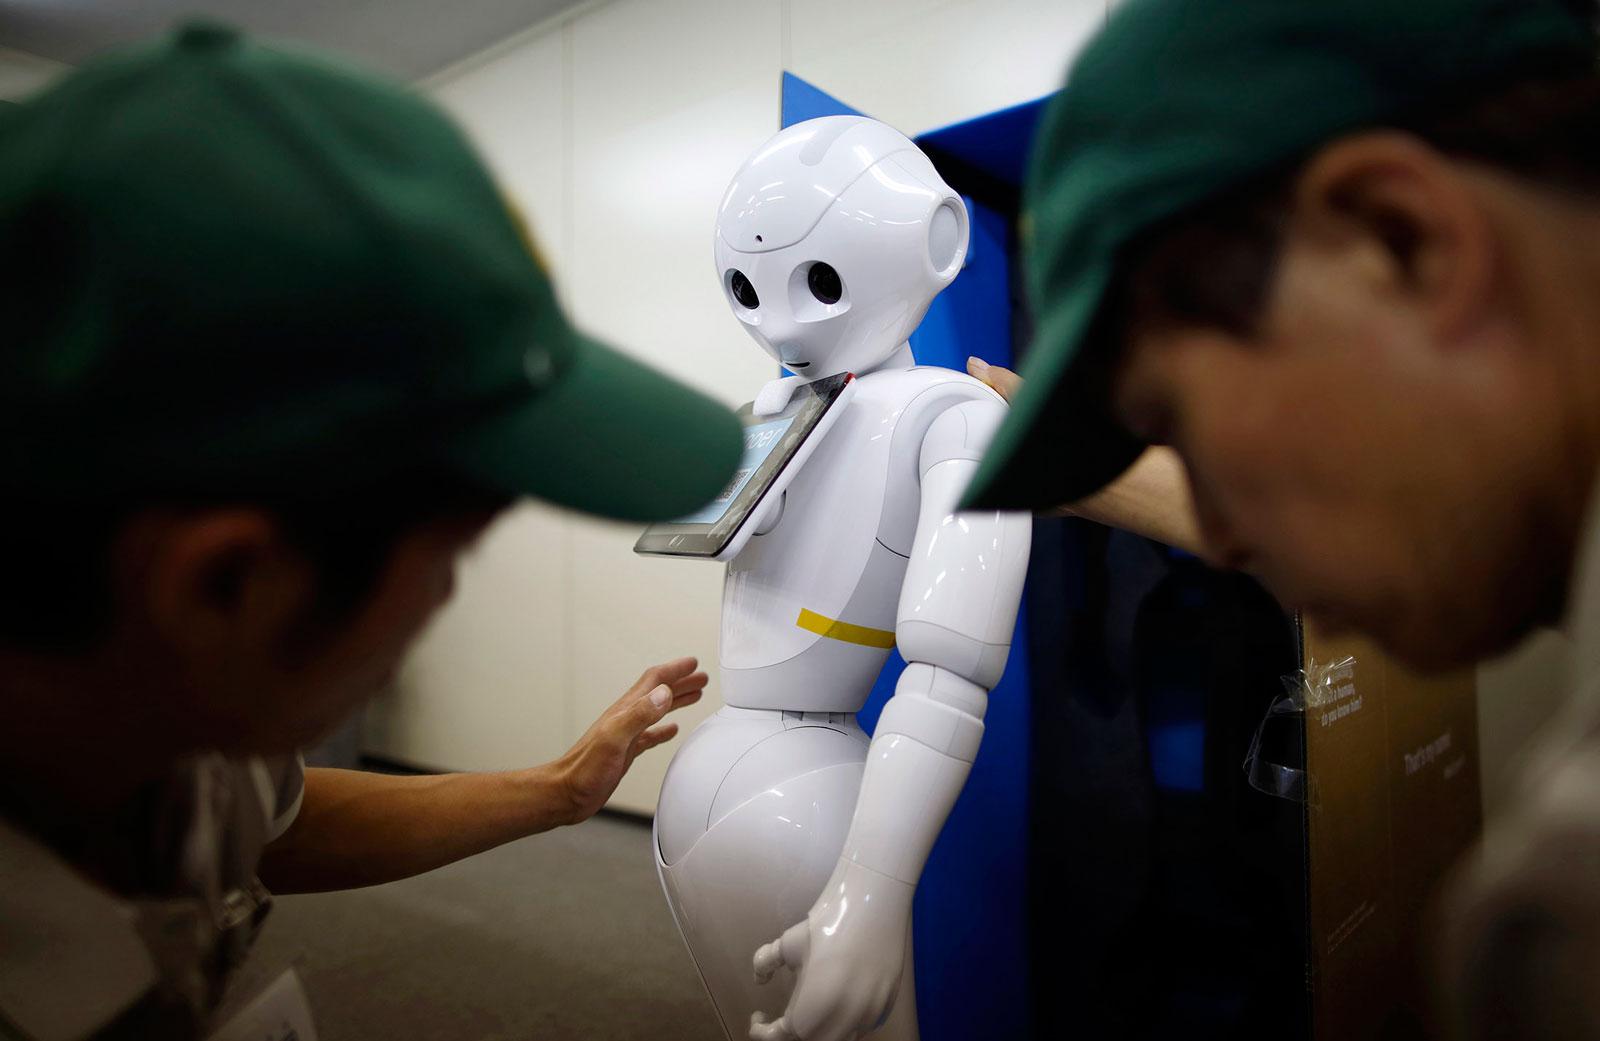 A box containing SoftBank's humanoid robot Pepper